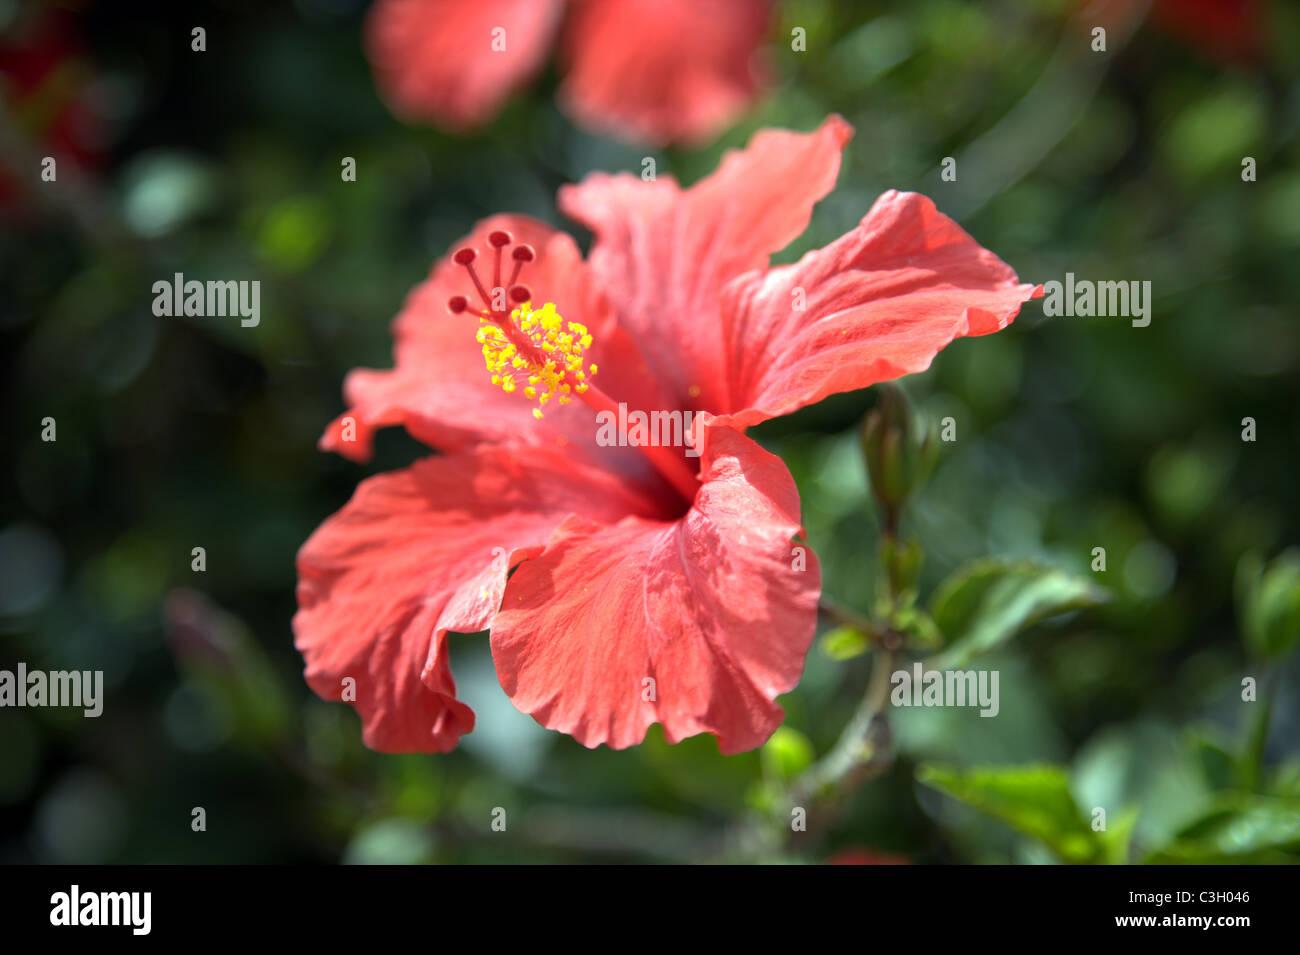 Red hibiscus in full bloom stock photos red hibiscus in full bloom red hibiscus flower in full bloom stock image izmirmasajfo